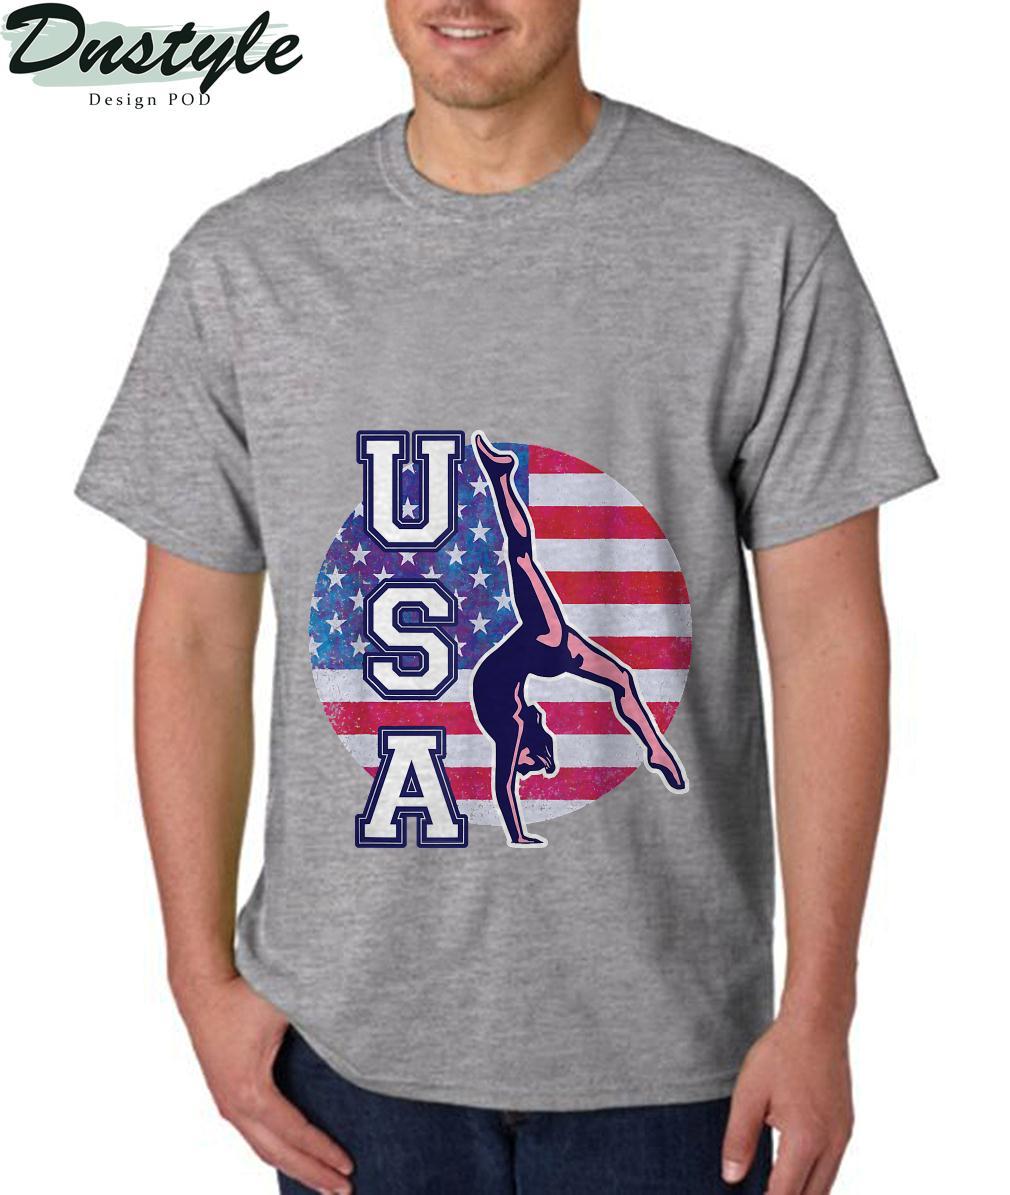 USA Gymnast Womens Gymnastics Team Athlete American Flag T-Shirt 3